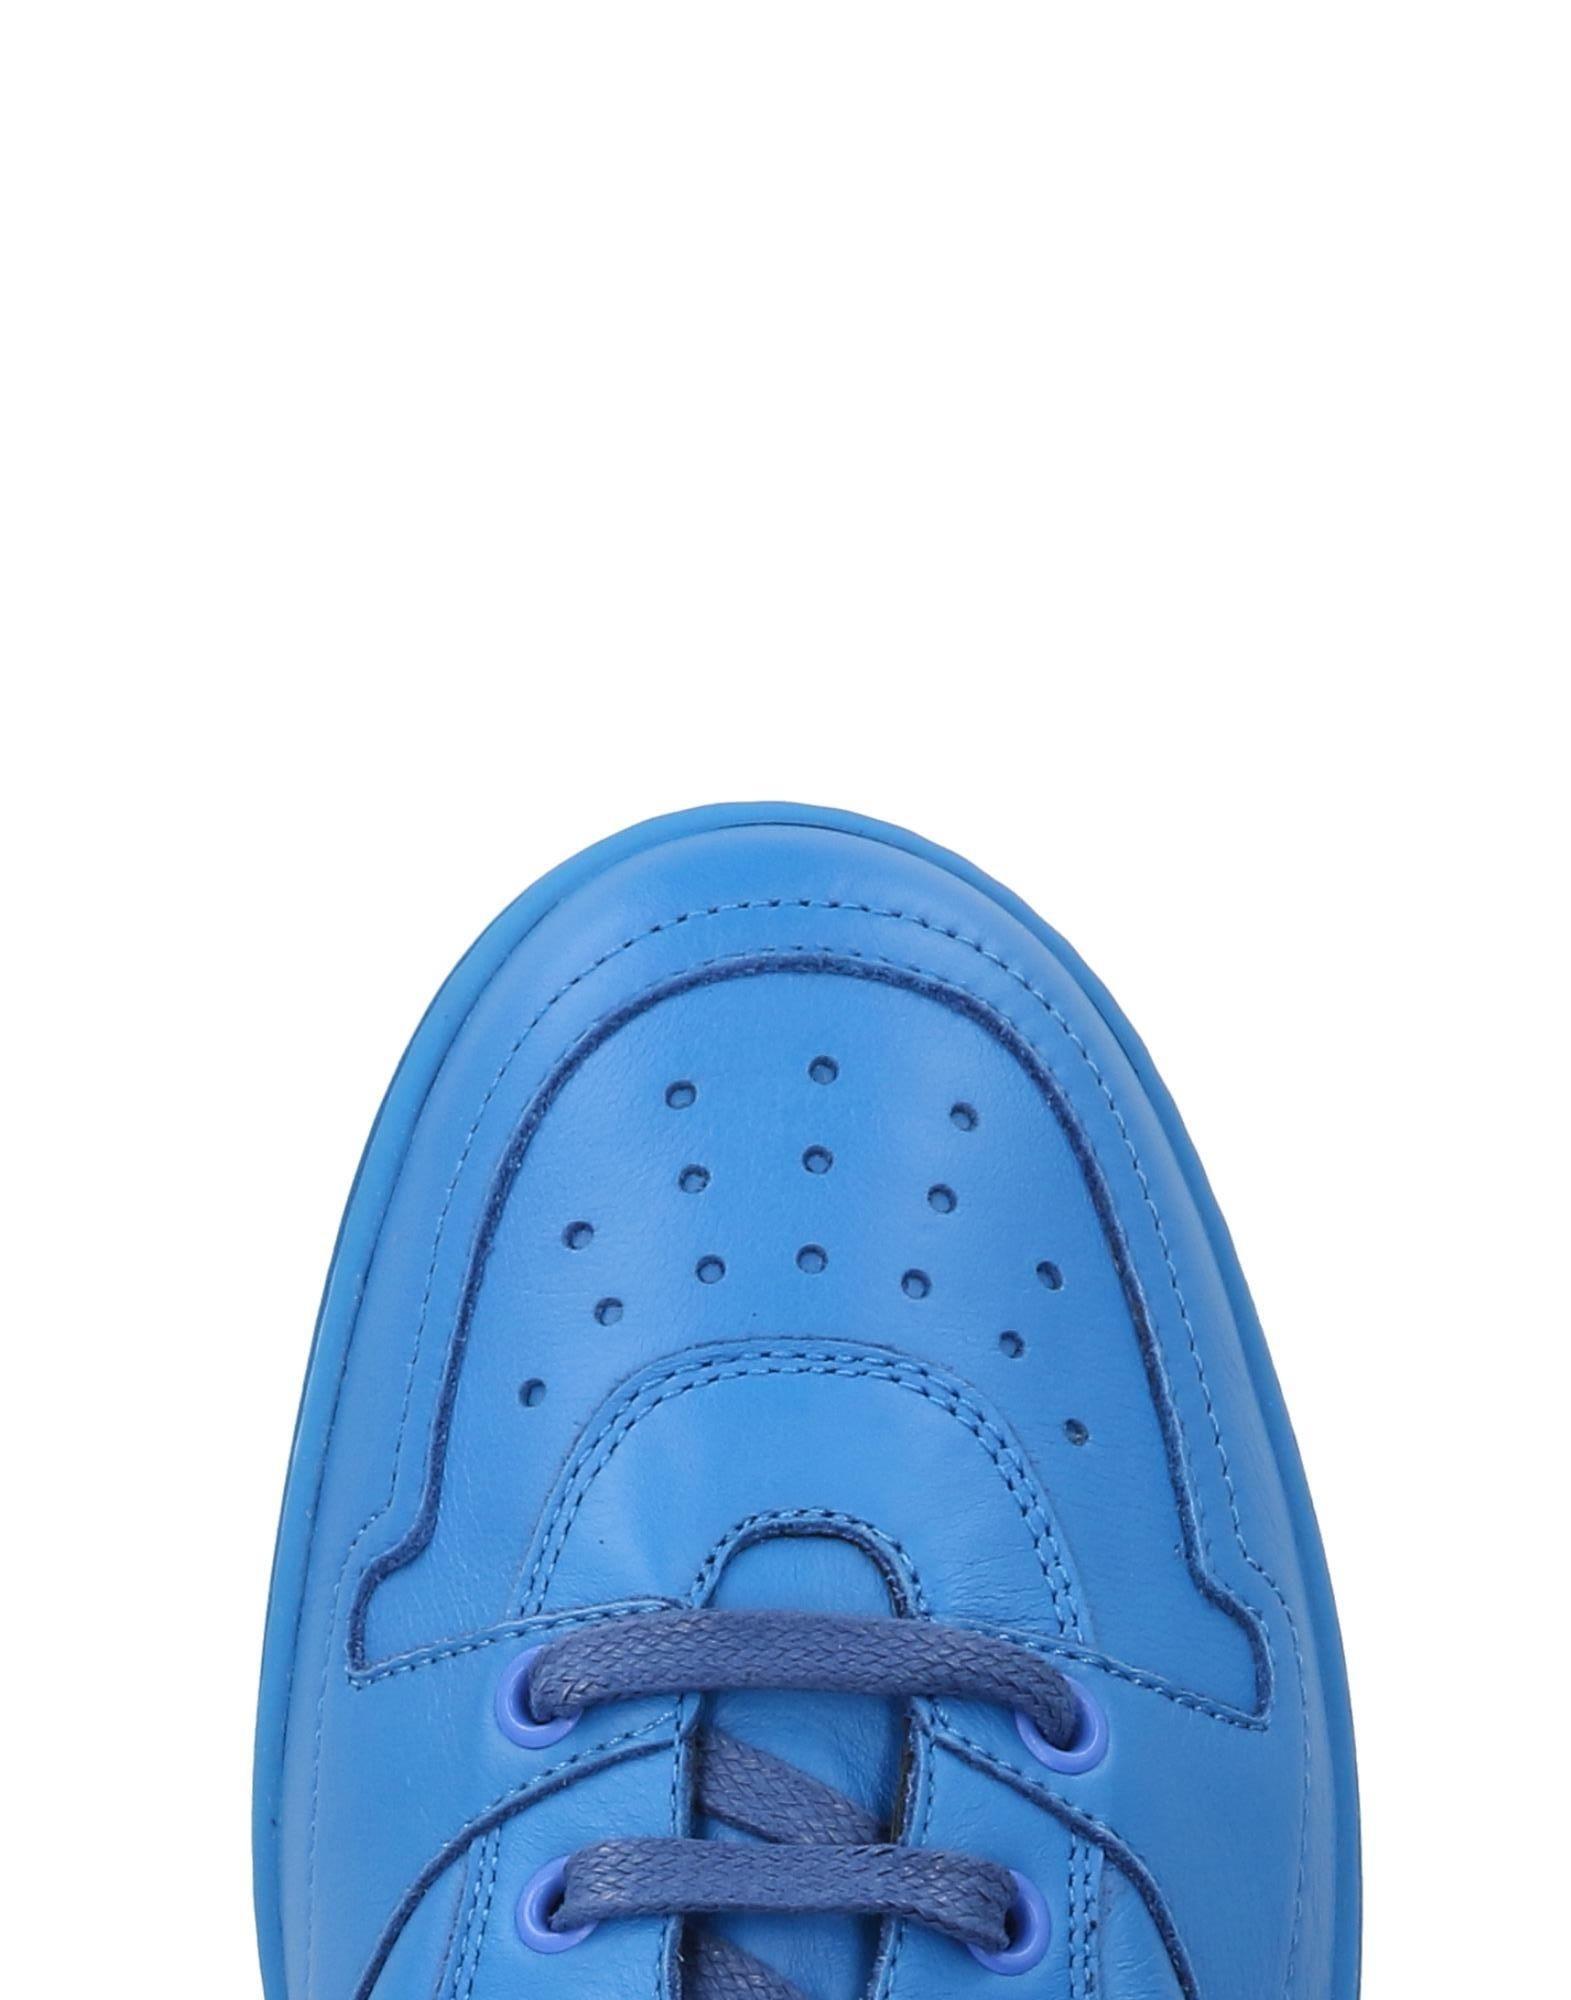 Moschino Sneakers Herren Qualität  11263878TF Gute Qualität Herren beliebte Schuhe b0c0d1